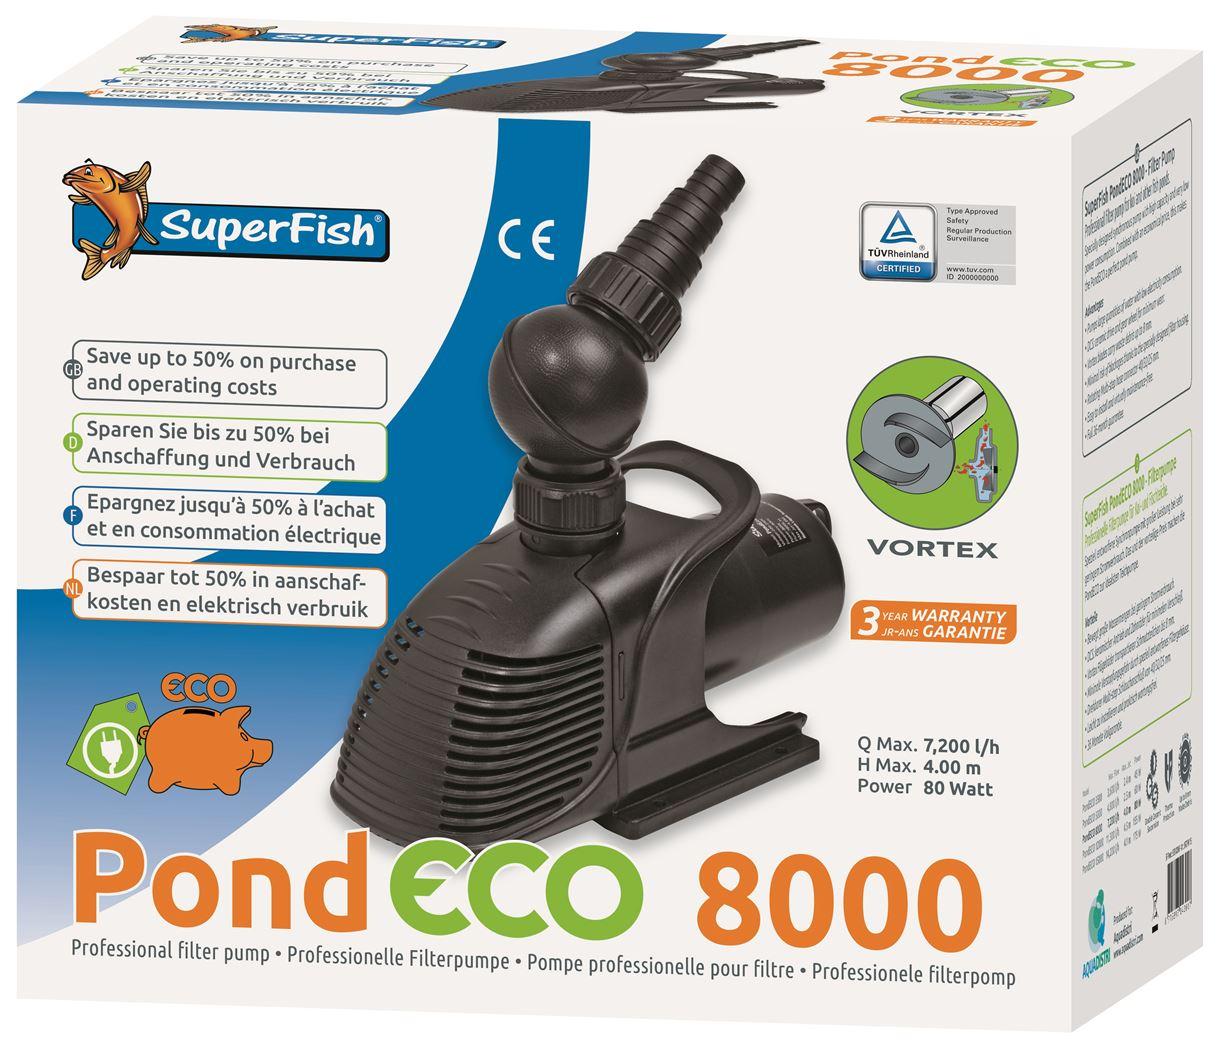 vijverpomp superfish pond eco 8000